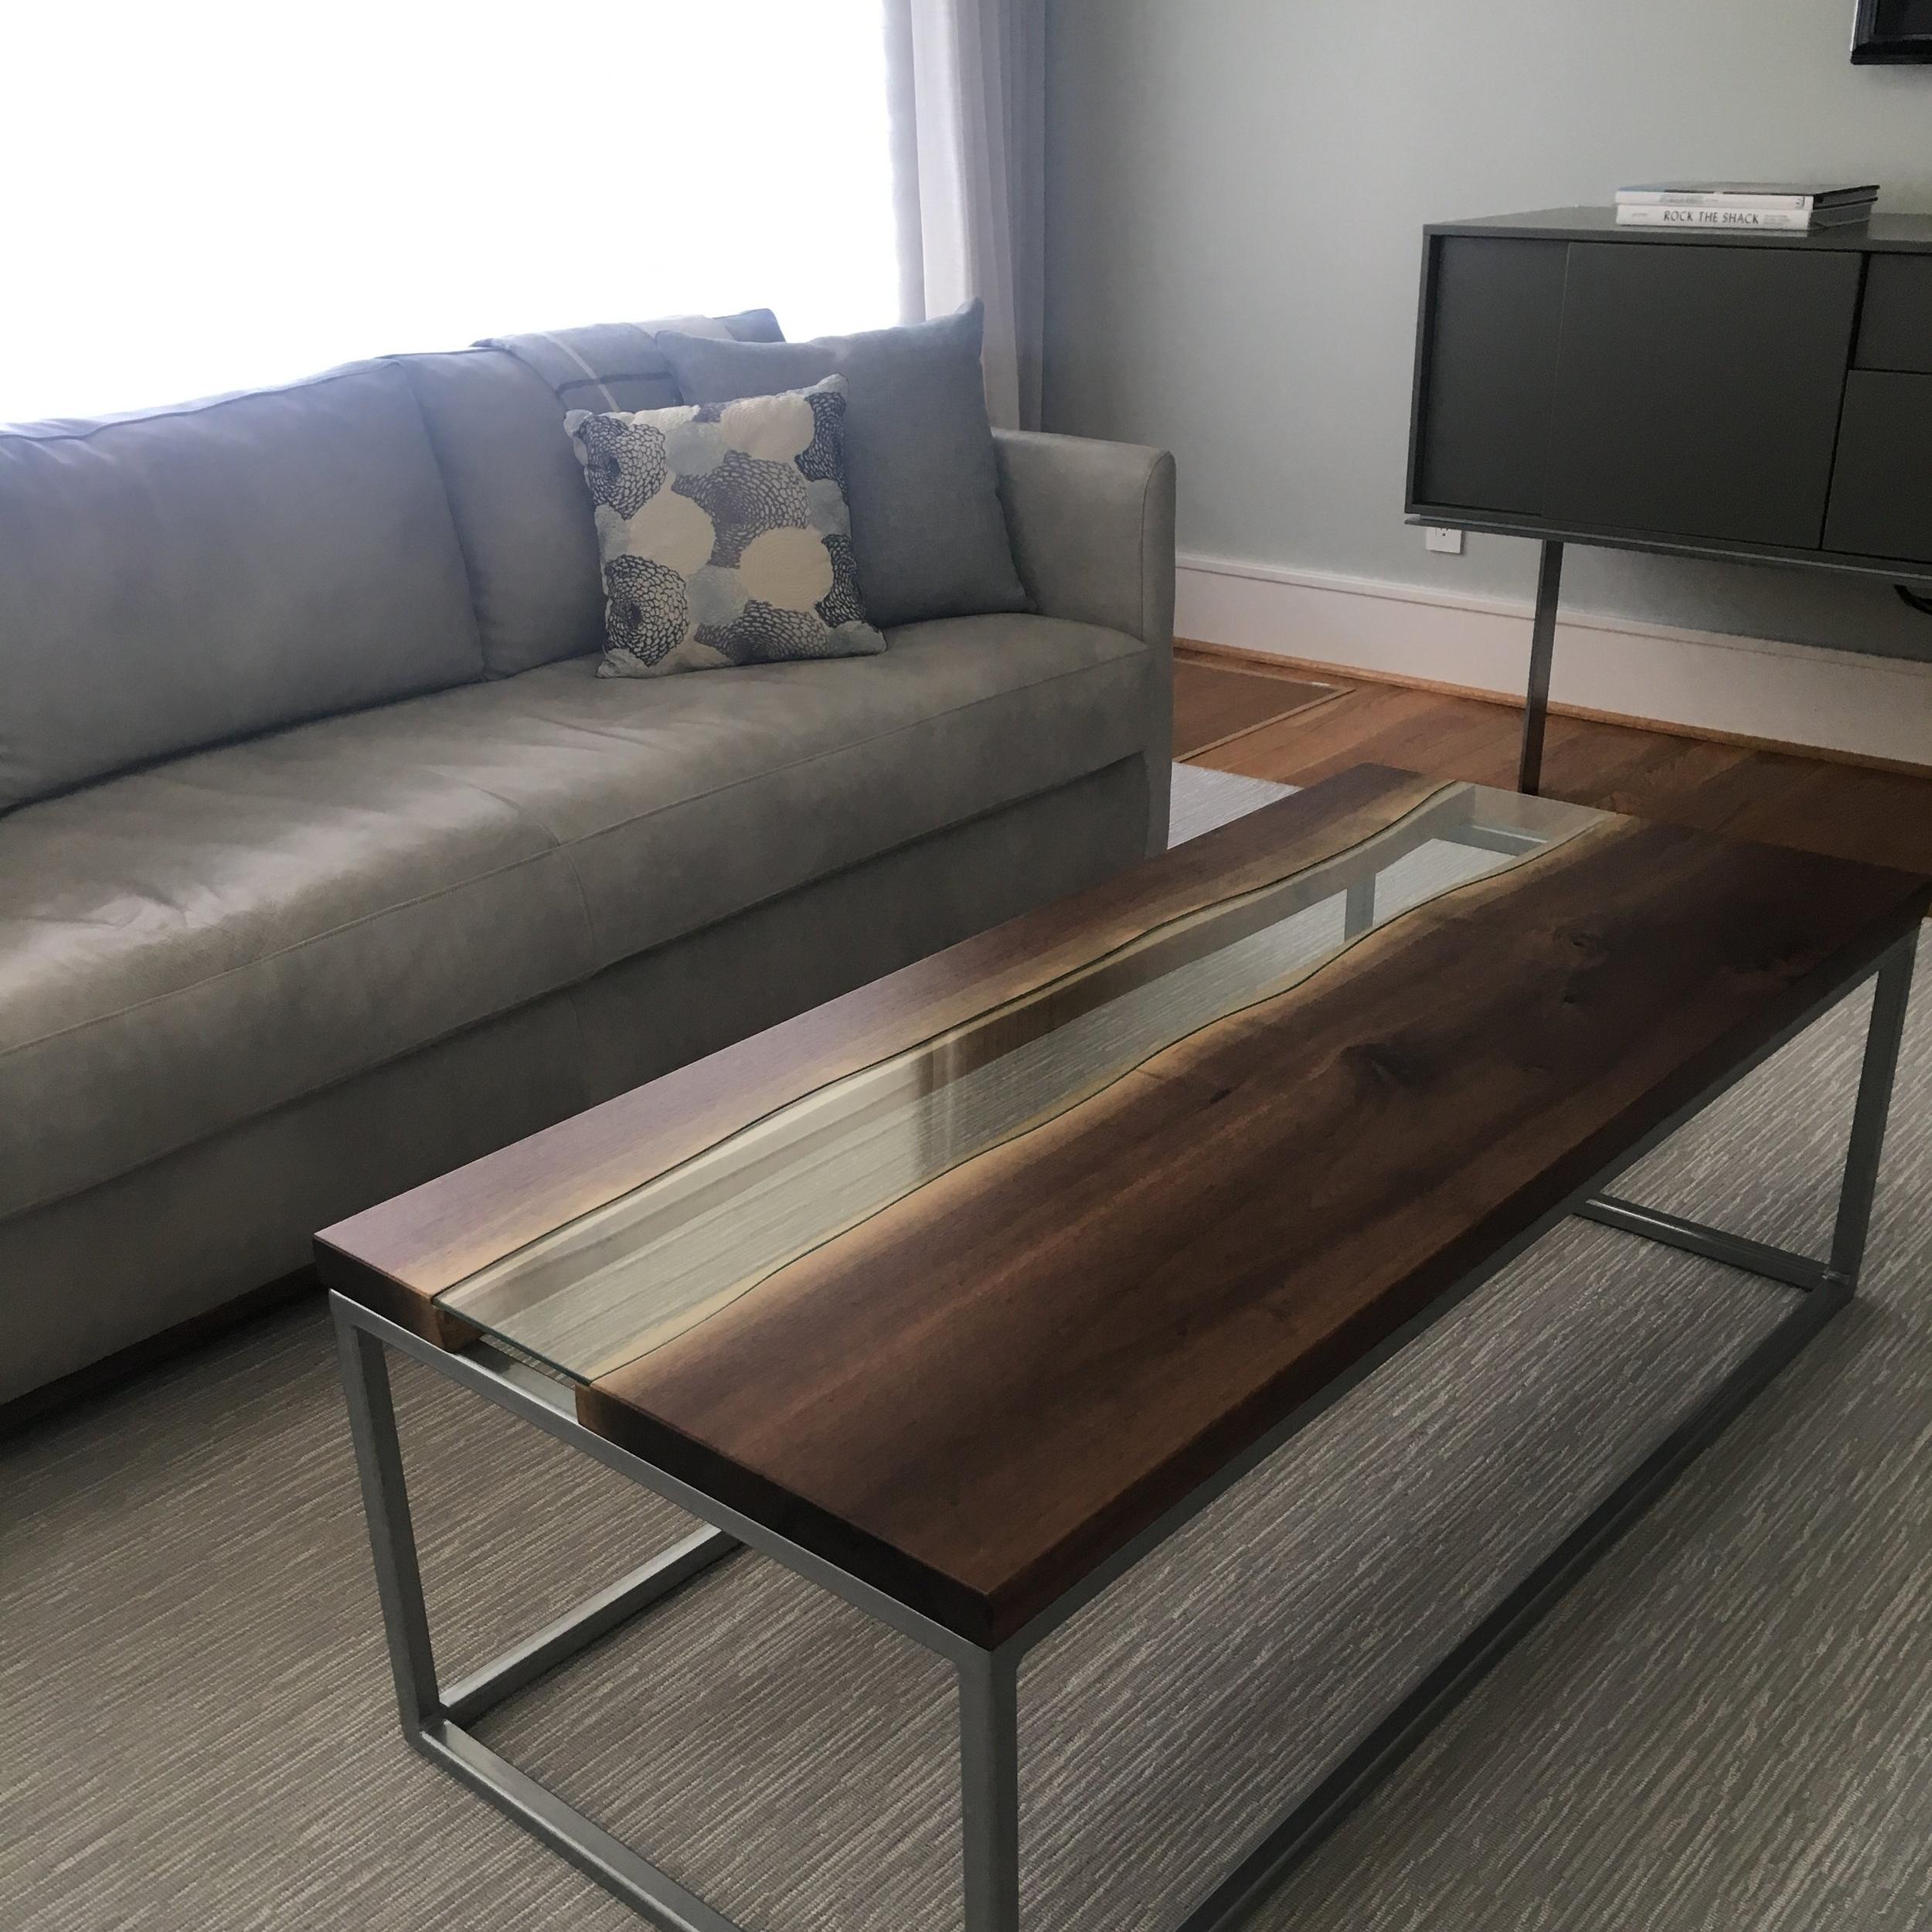 Remade in the USA Austin Living Room   Robin Colton Interior Design Studio Austin Texas Blog   www.robincolton.com